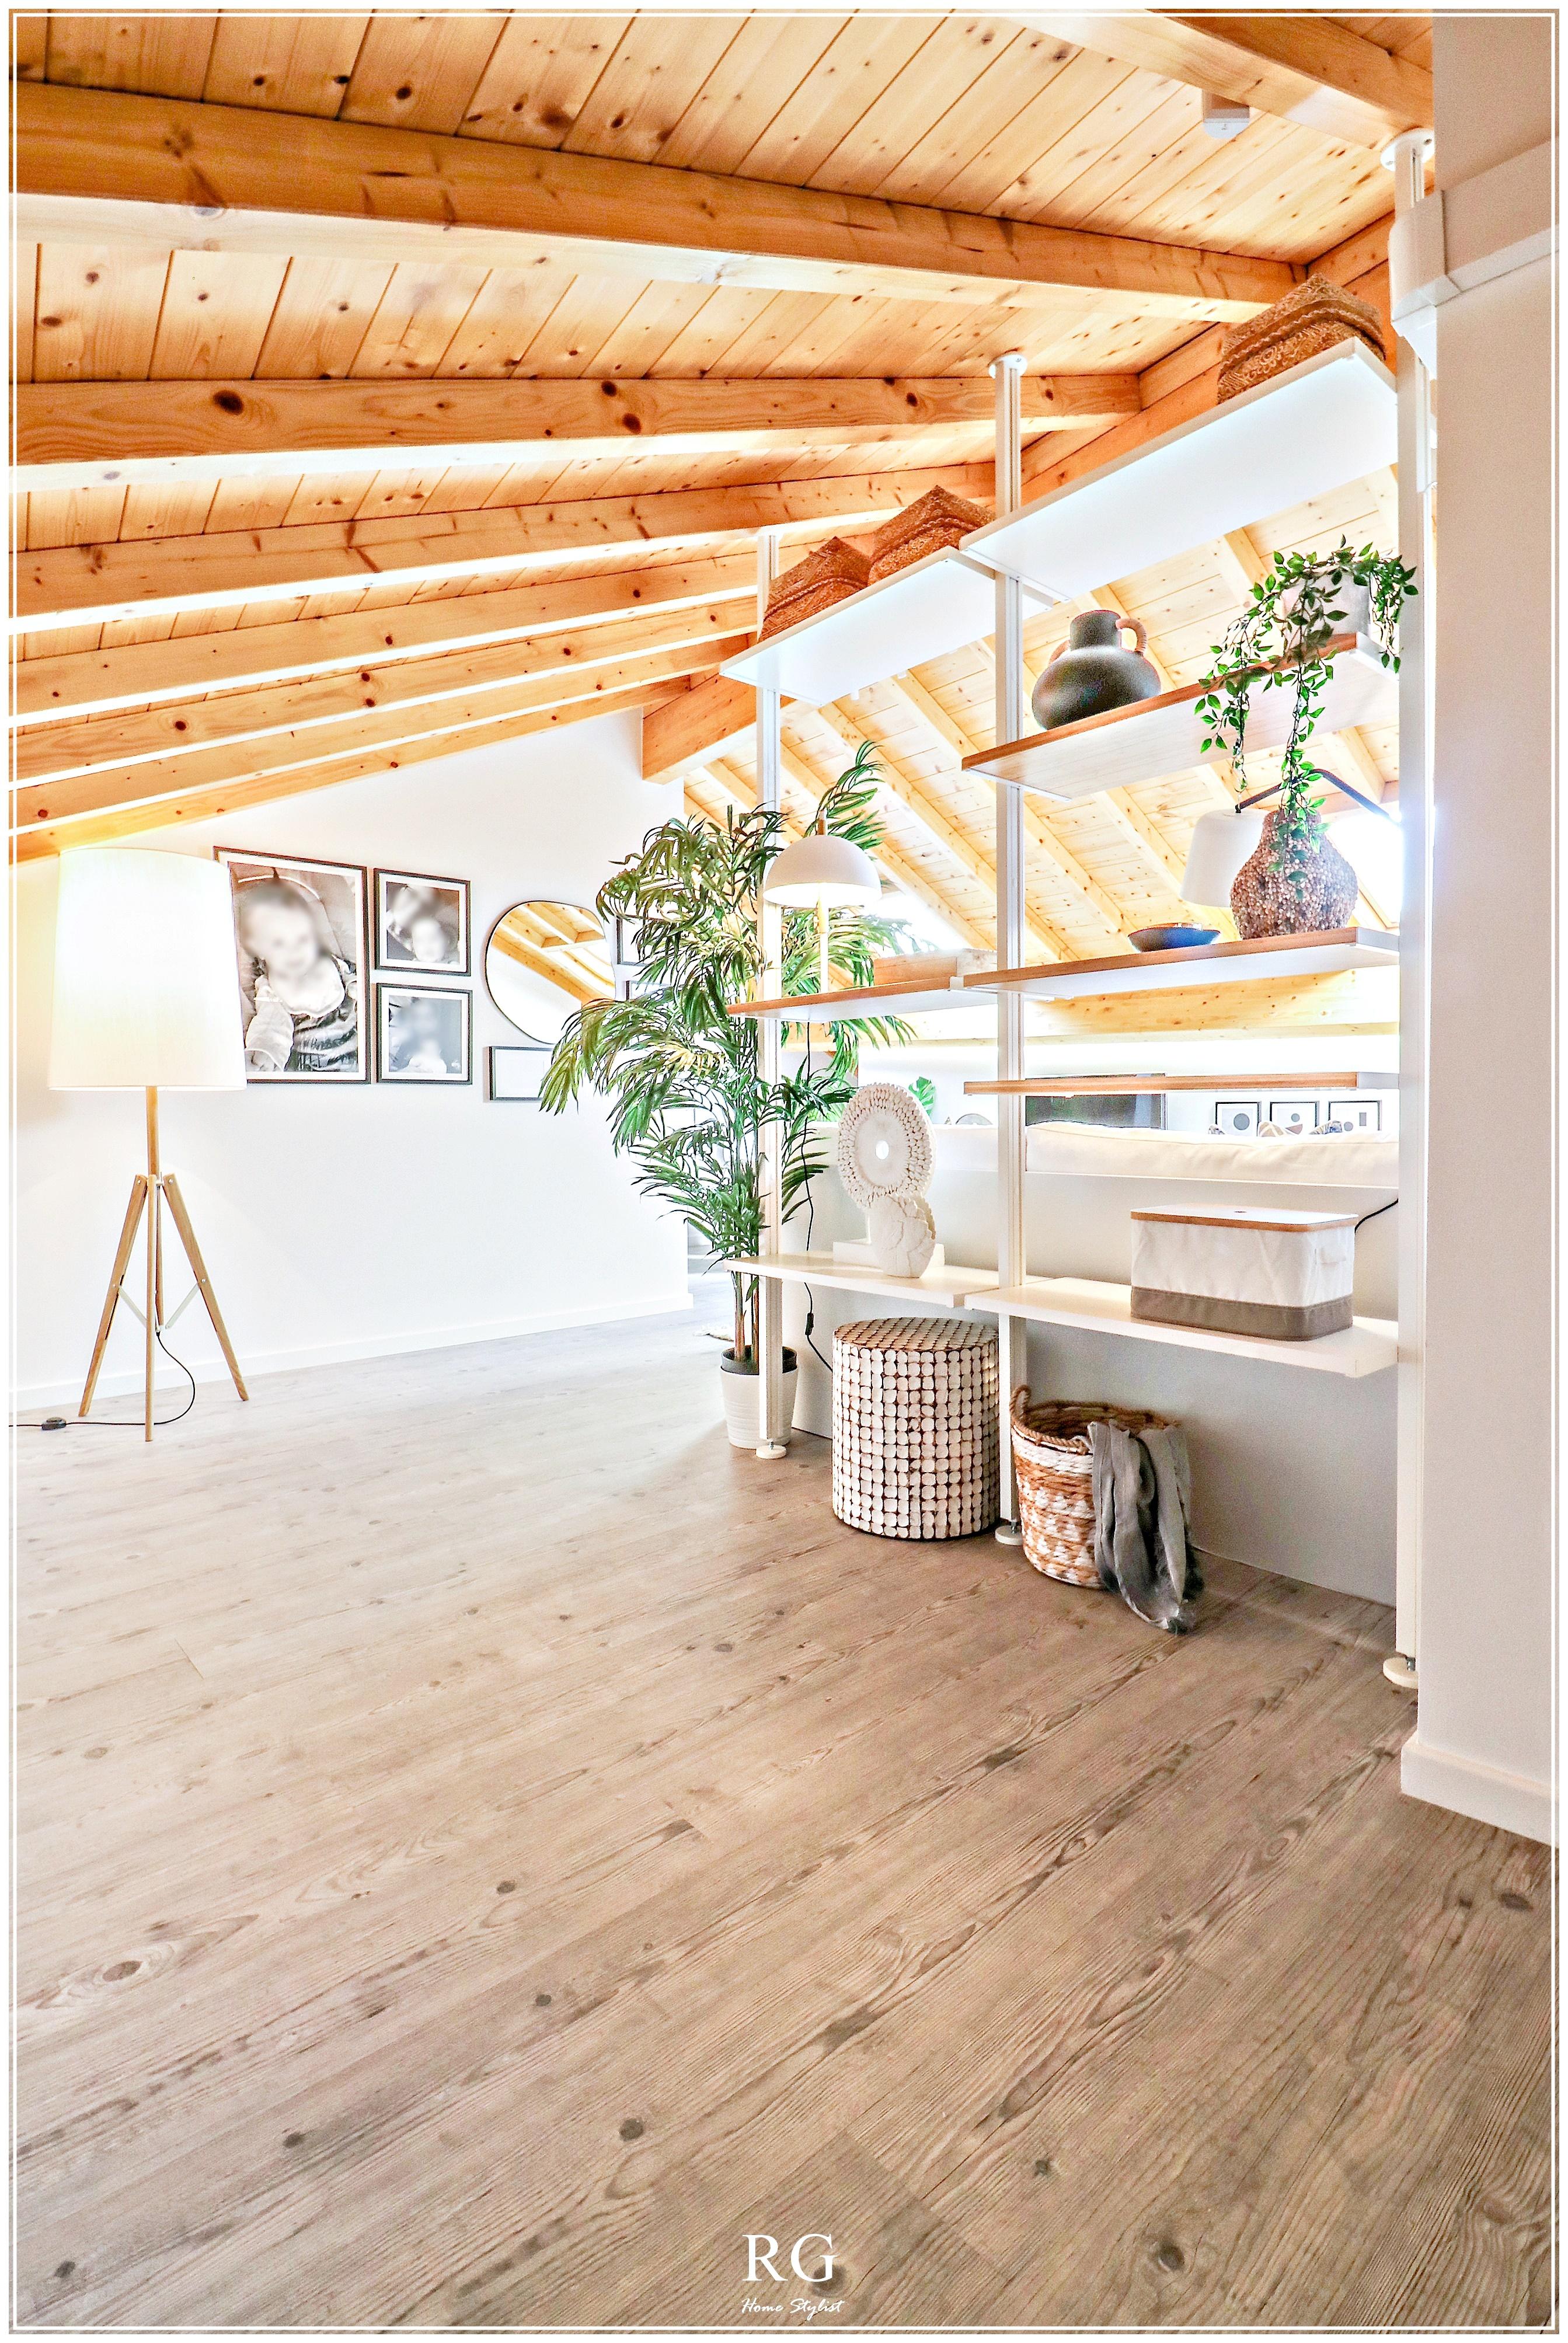 Projeto - The Attic guest room